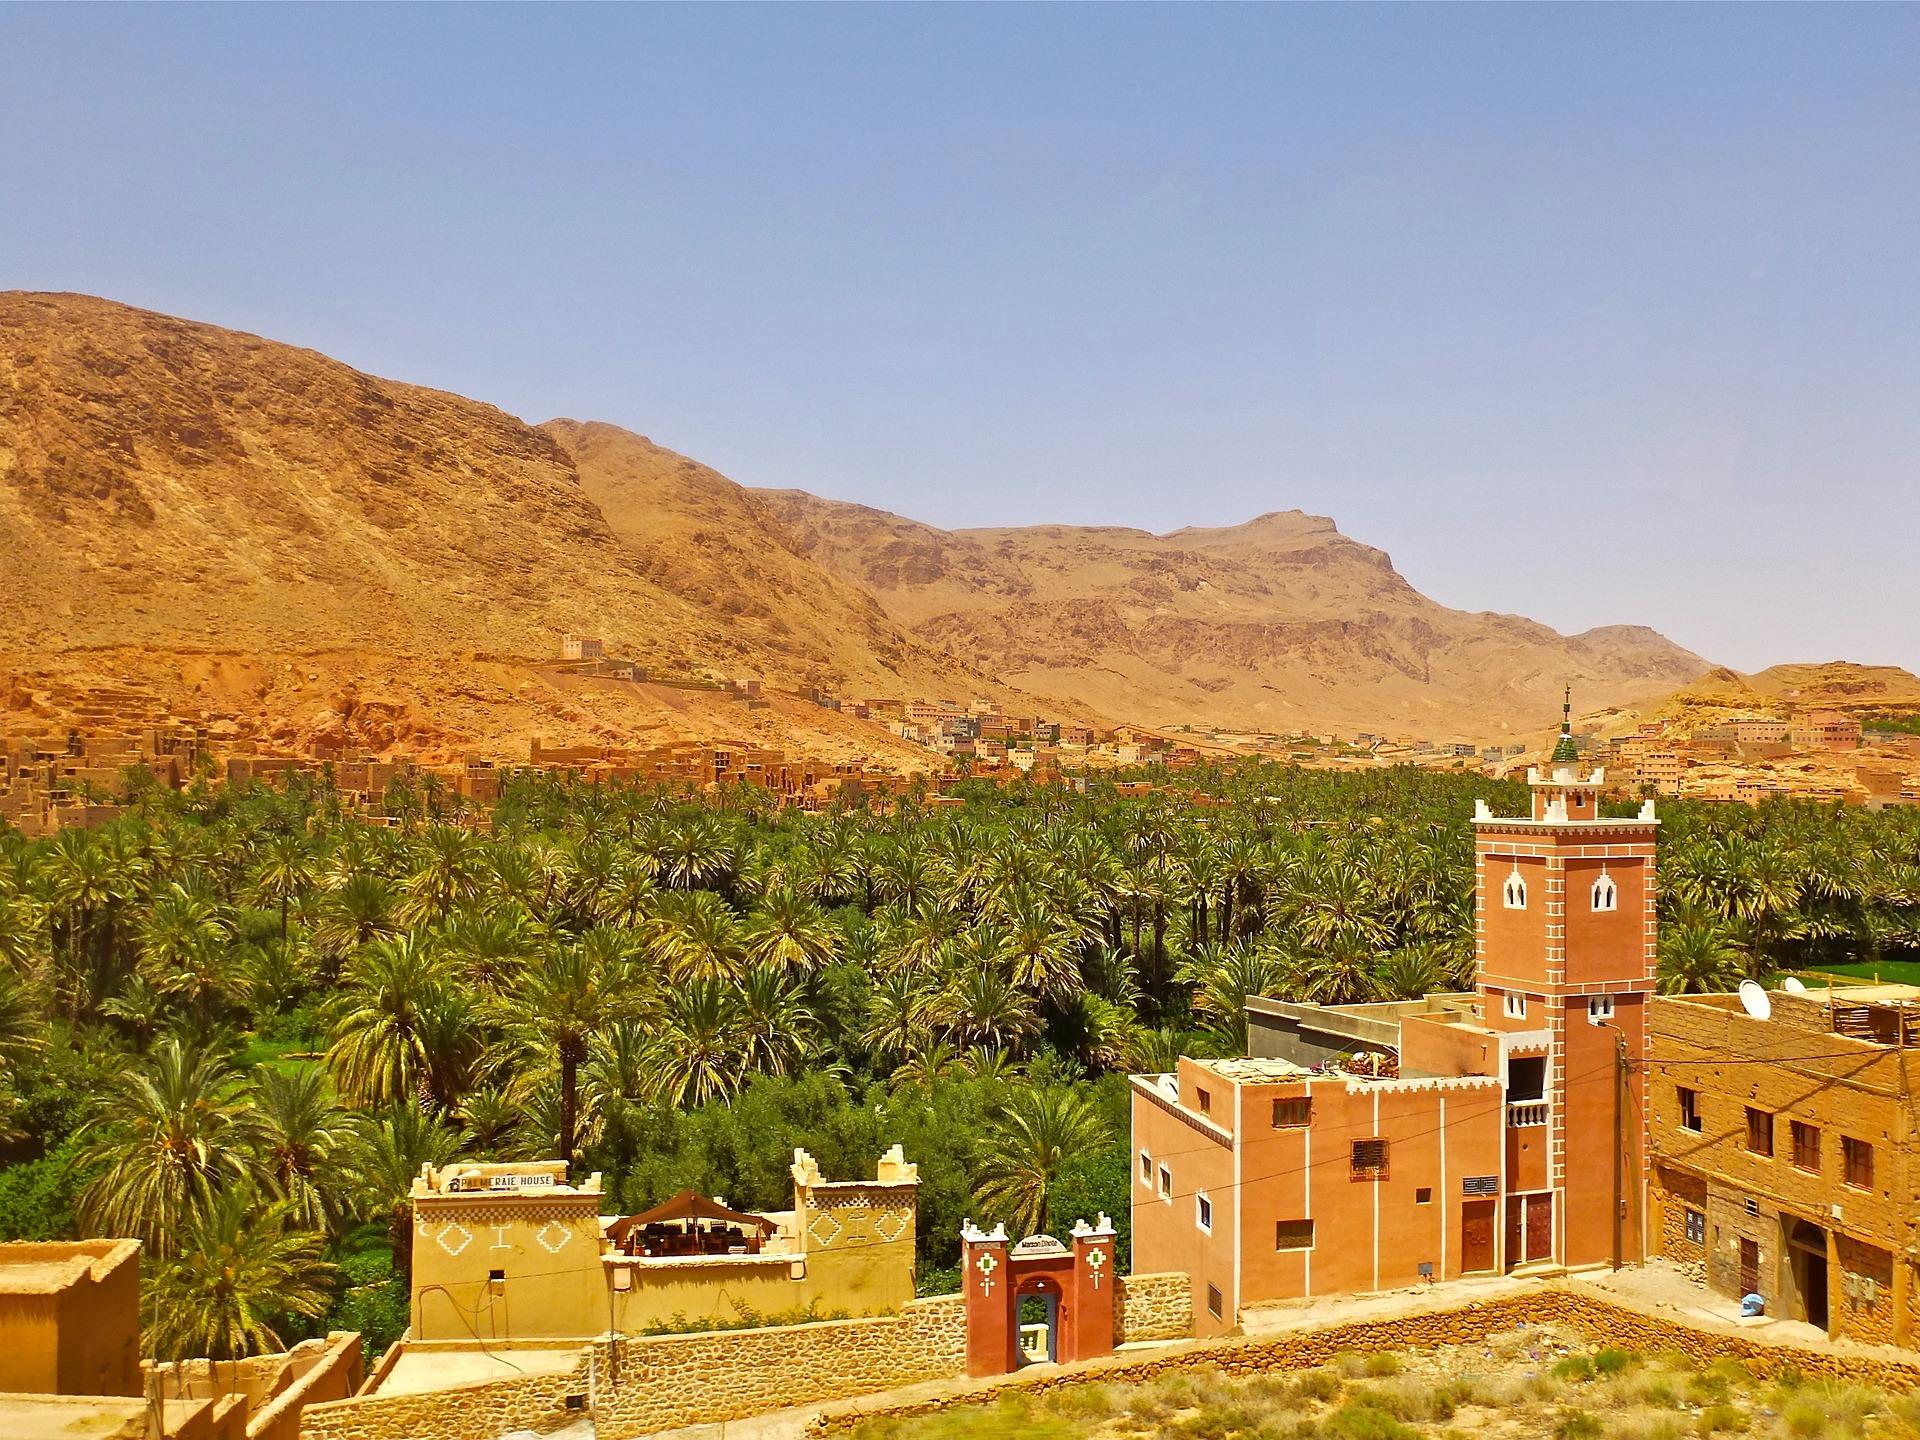 morocco-1188589_1920